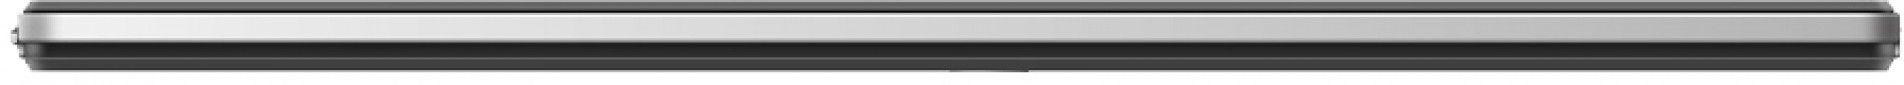 Планшет Prestigio MultiPad 4 Diamond 10.1 3G Black (PMT7177_3G_D_BK) 2